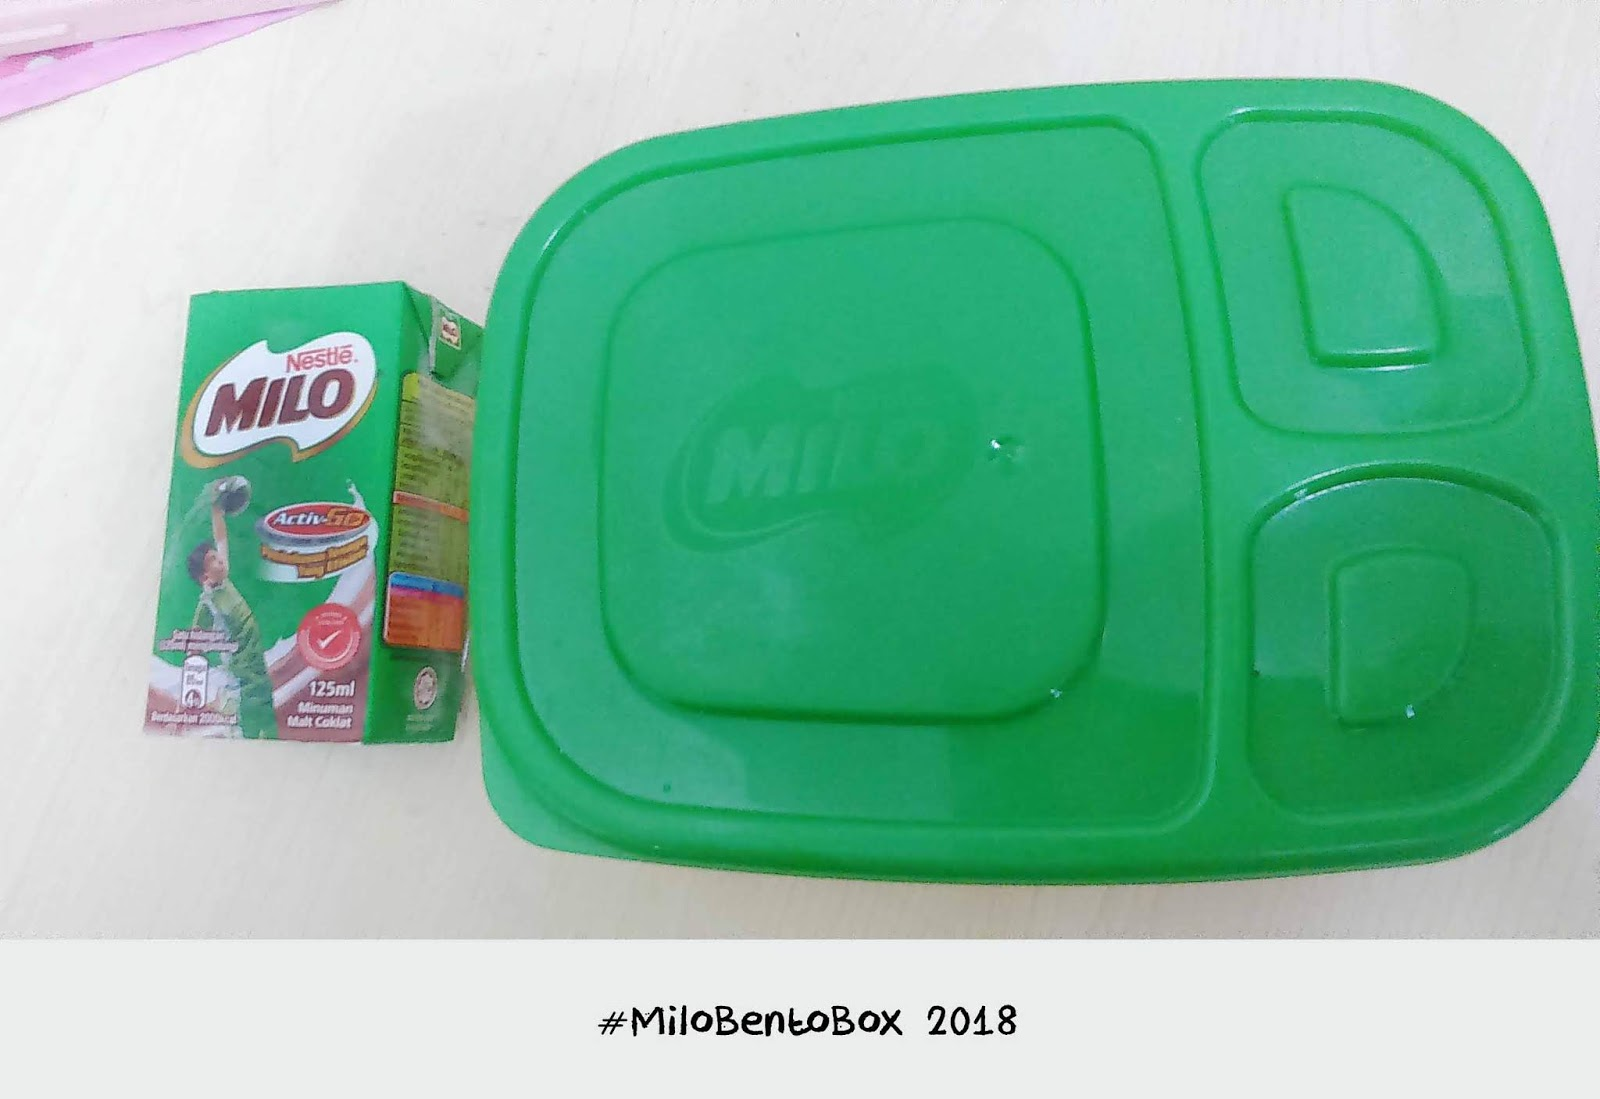 Koleksi Idea Bento Menarik Sempena Peraduan MILO Bento Box 2018 , idea bento menarik, bento mudah, bento cute, bento comel, bento simple, hiasan bento comel